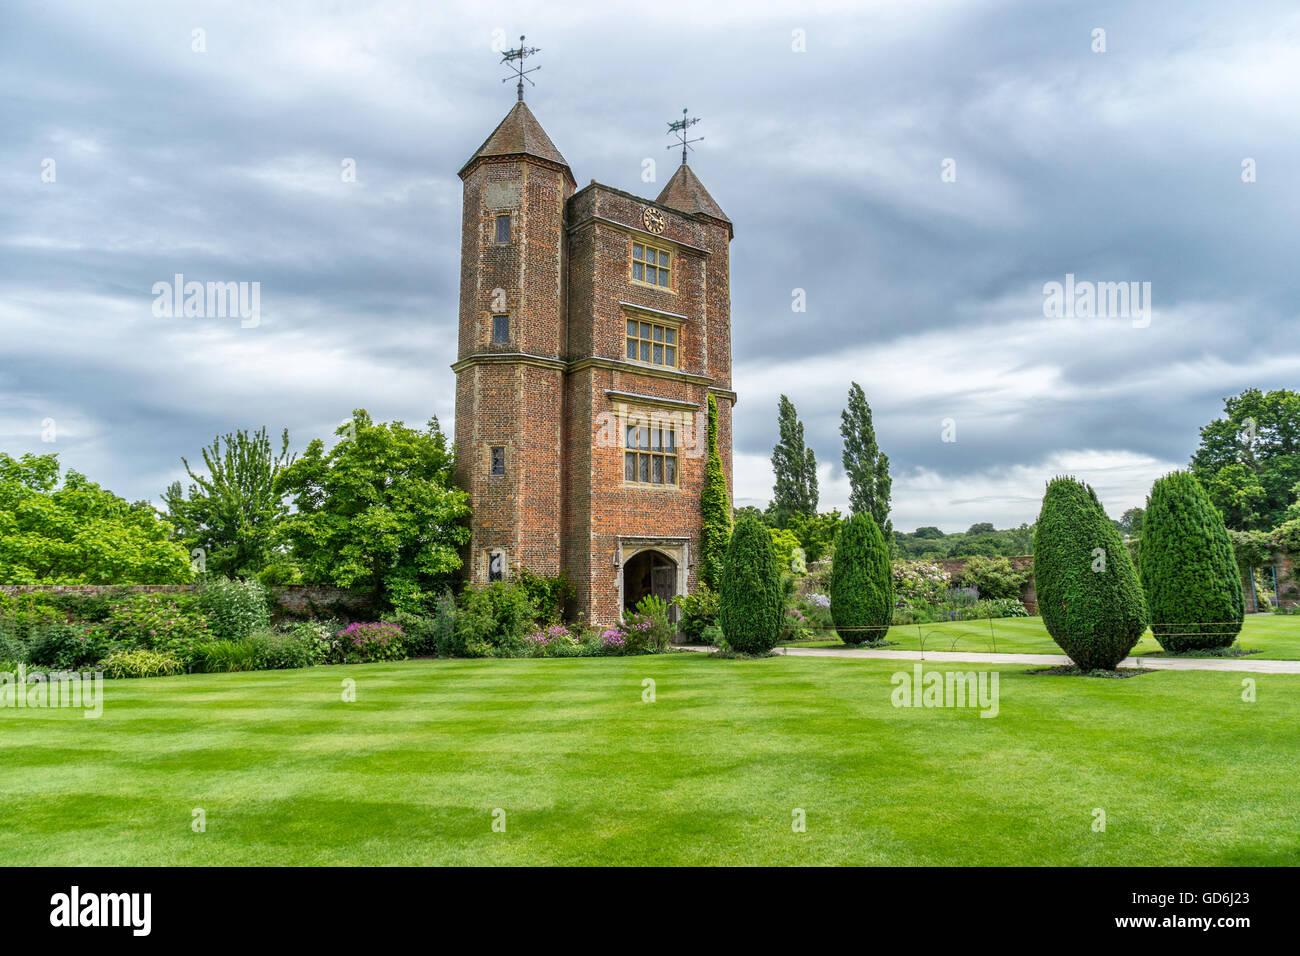 The Edwardian Tower at Sissinghurst - Stock Image